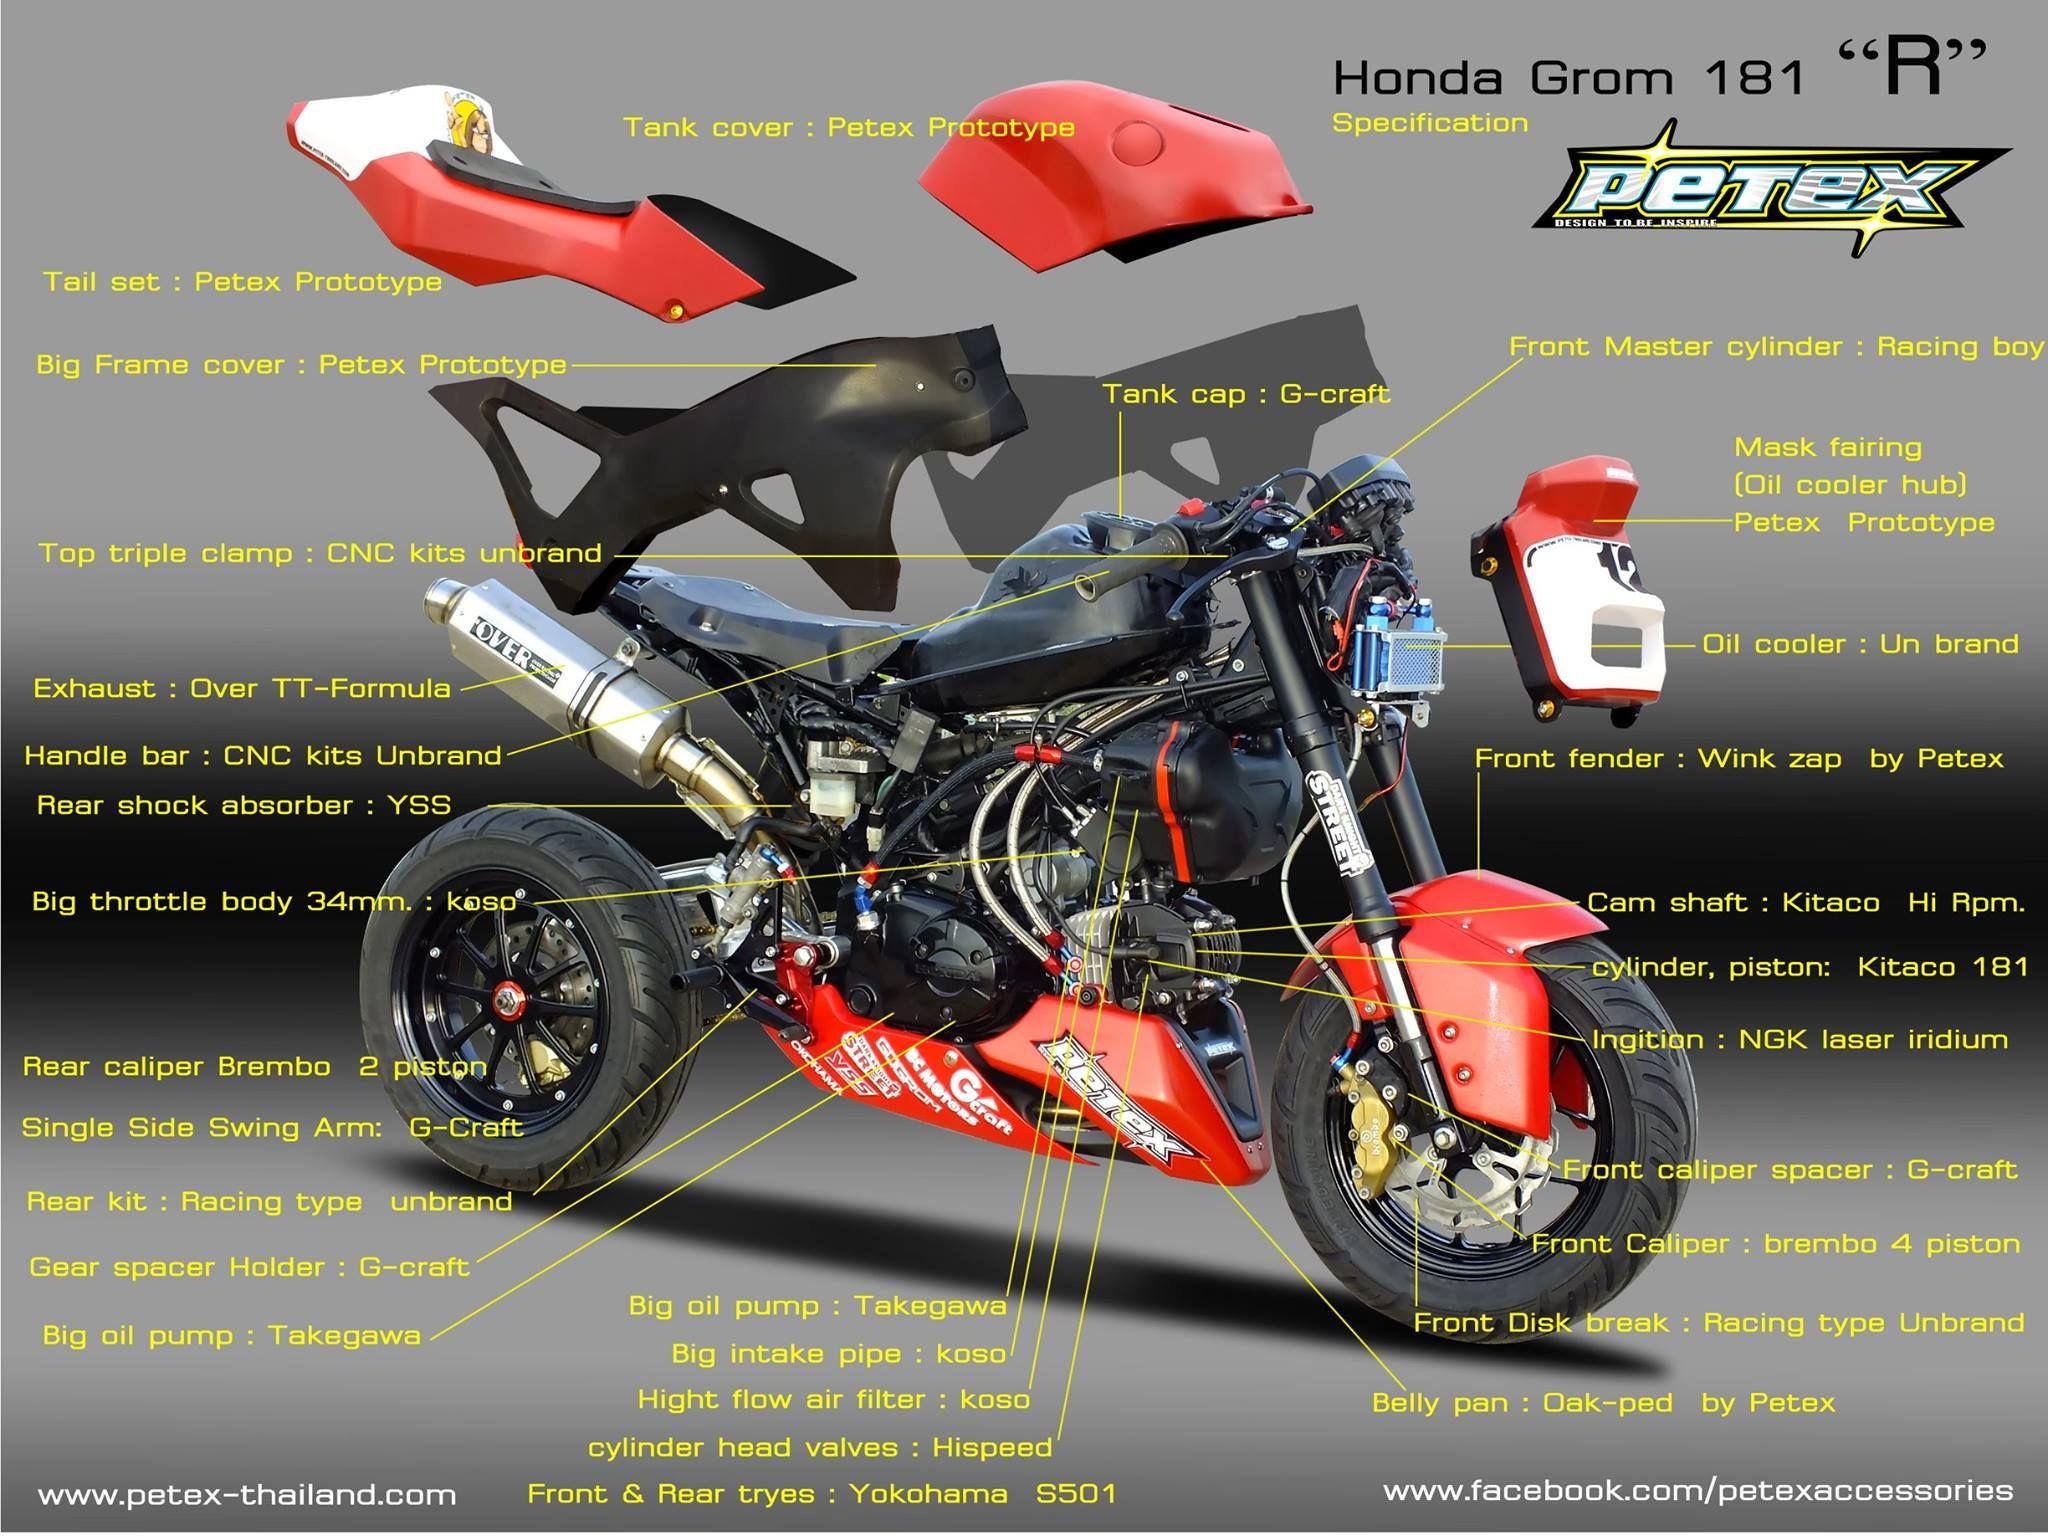 Pin by HypshotX on Custom Honda Grom | Motorcycle, Mini bike